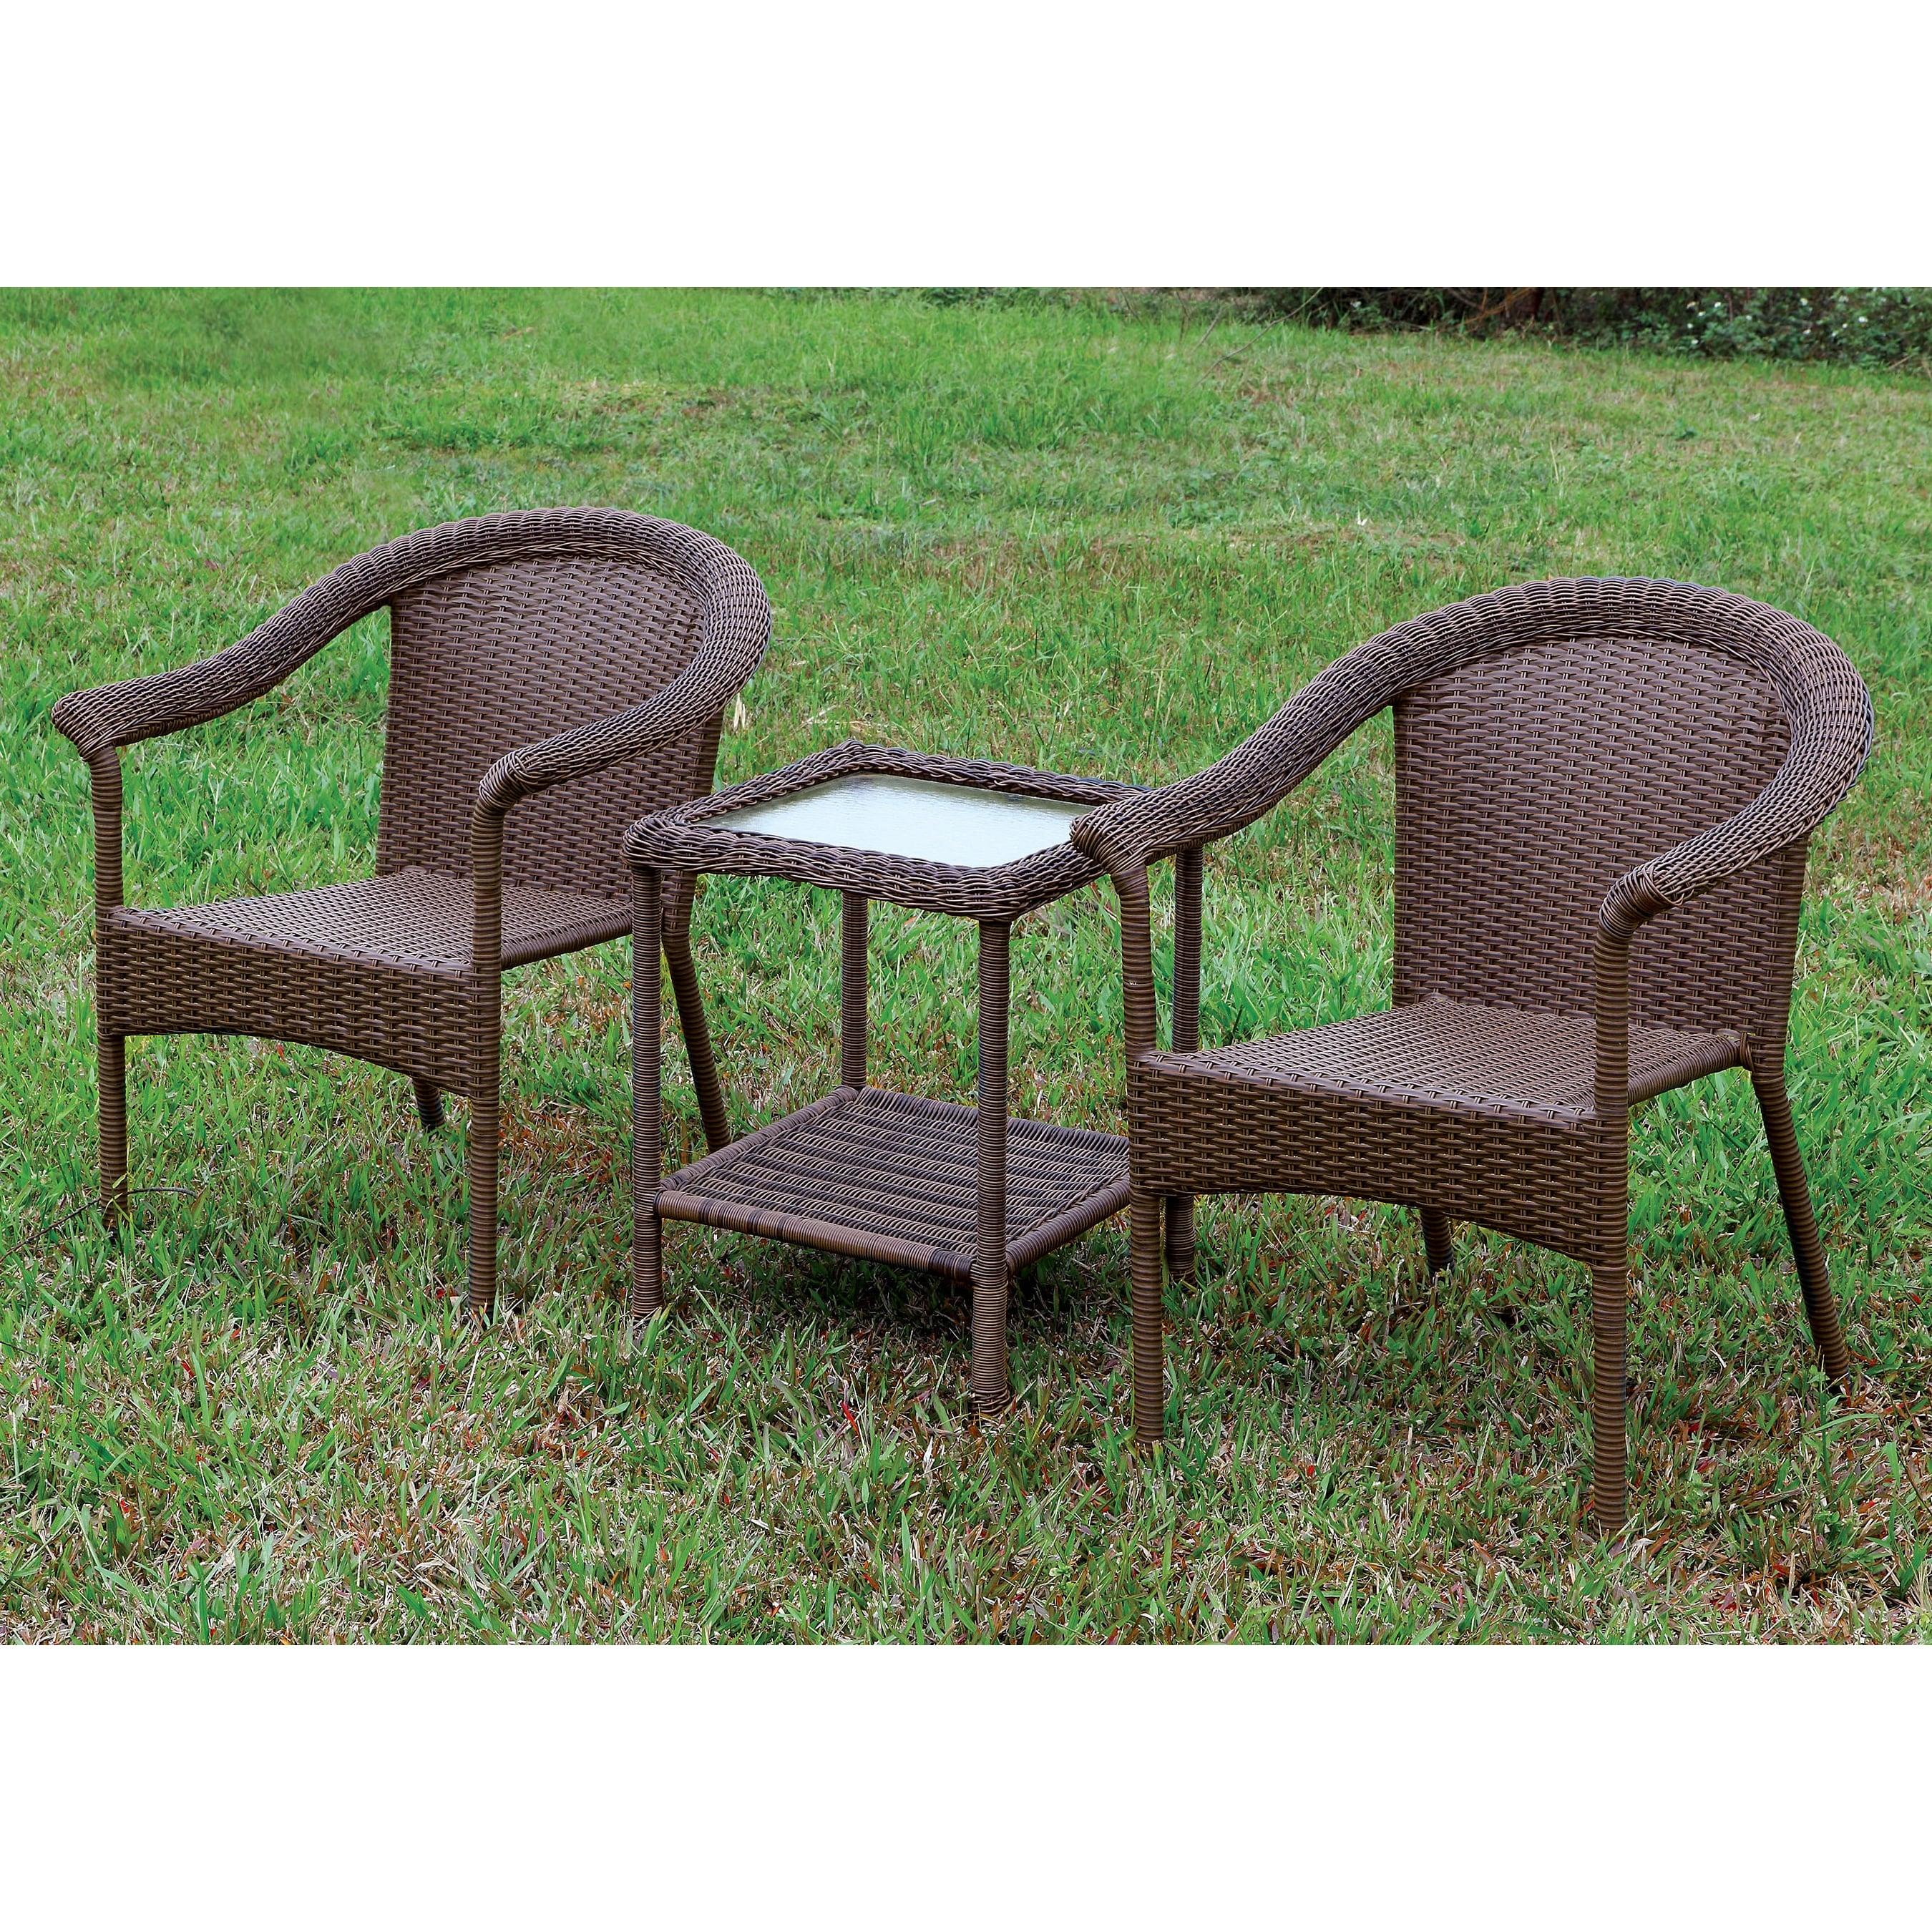 Shop furniture of america dahlee 3 piece espresso patio set free shipping today overstock com 9969719